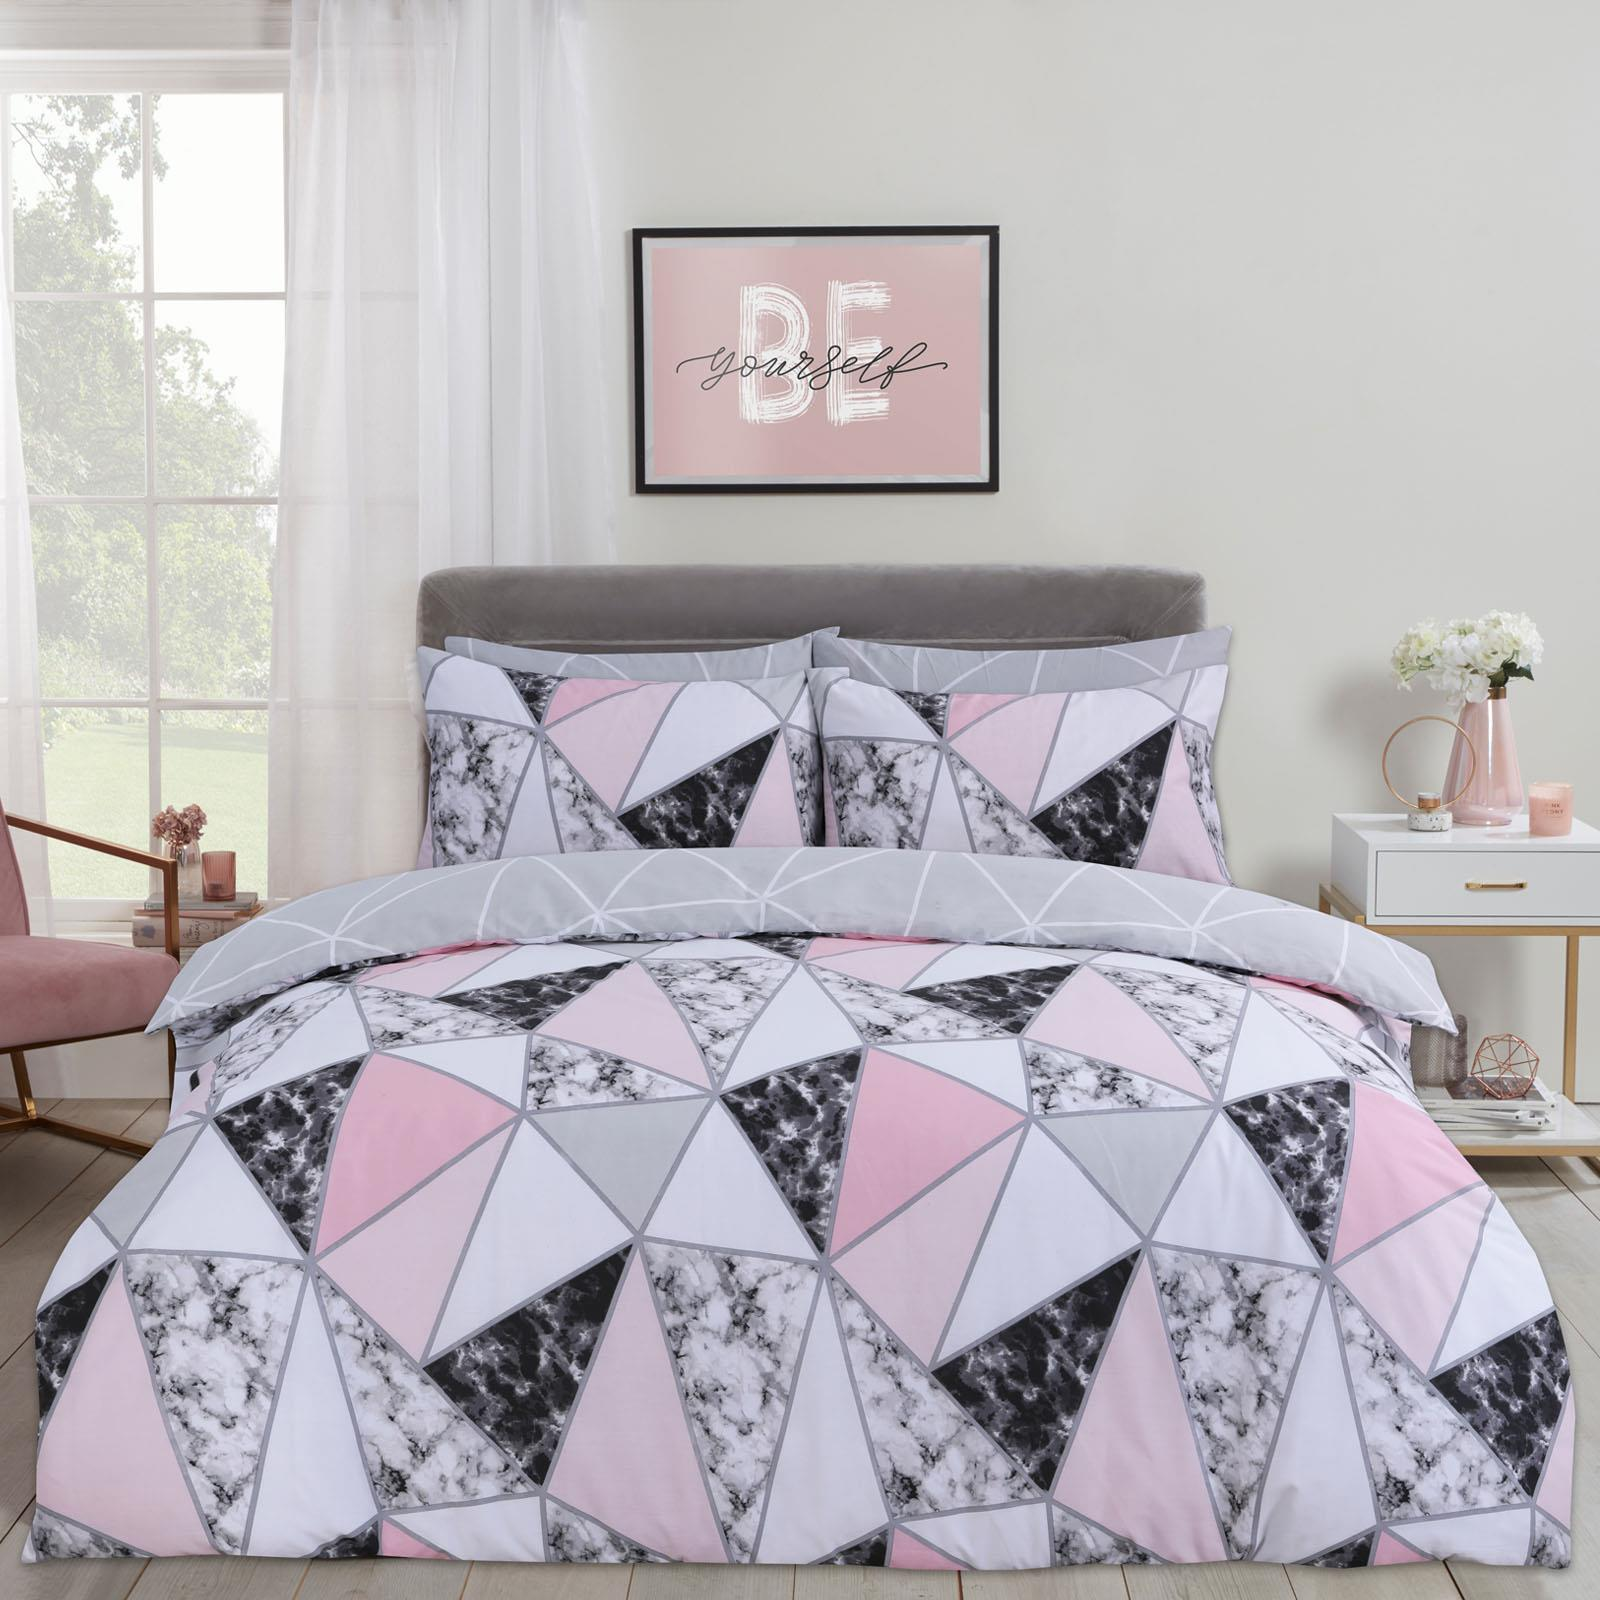 thumbnail 8 - Dreamscene Marble Geometric Duvet Cover with Pillowcase Bedding Set Grey Blush